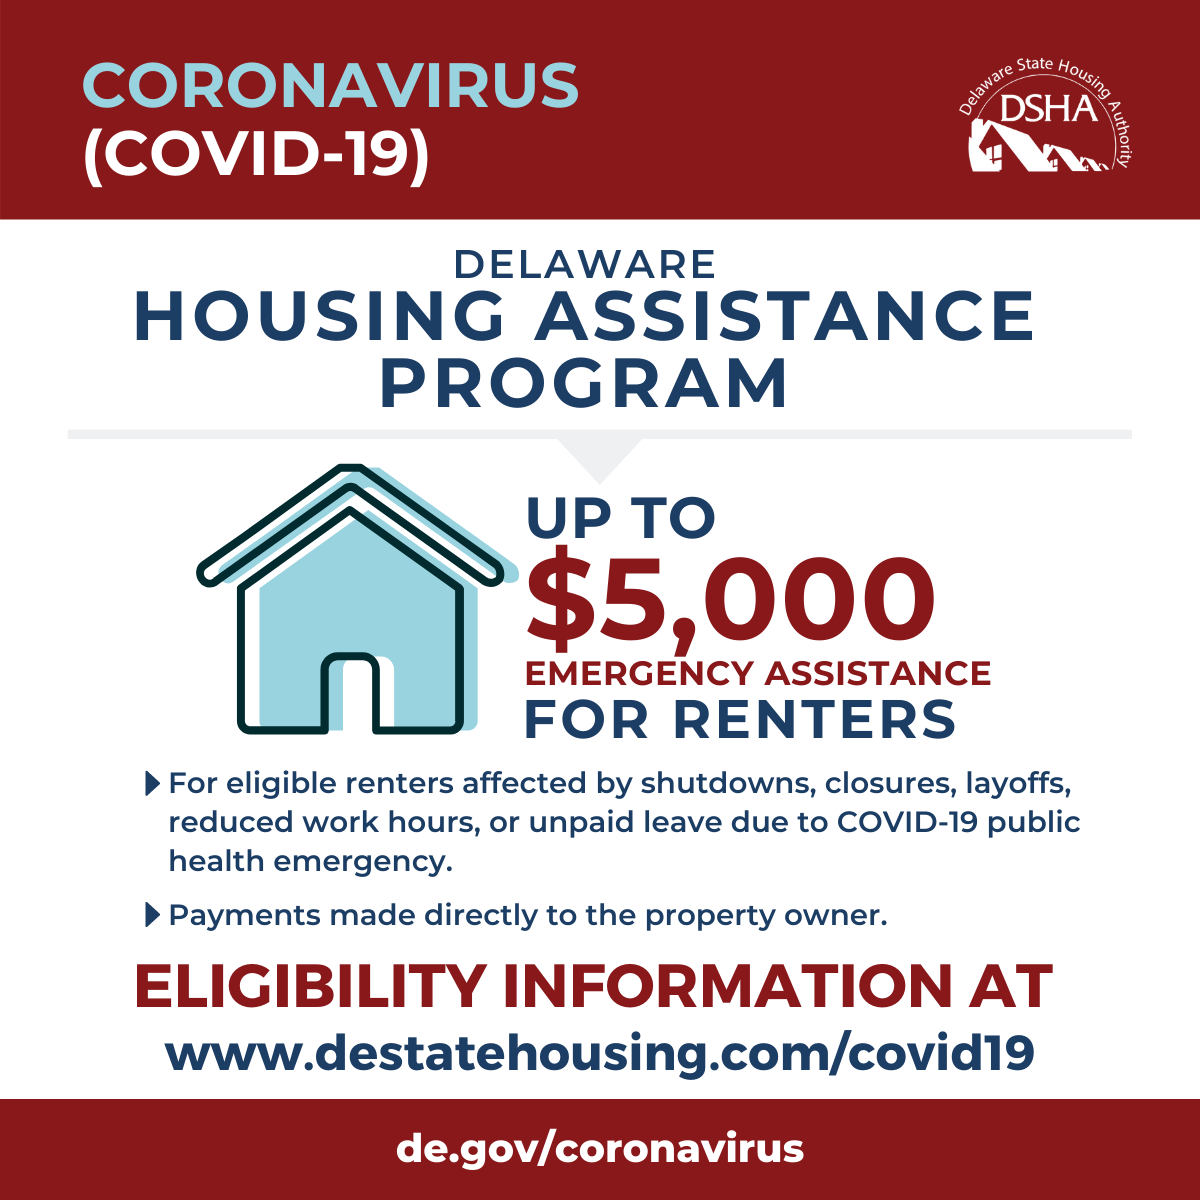 Delaware Housing Assistance Program